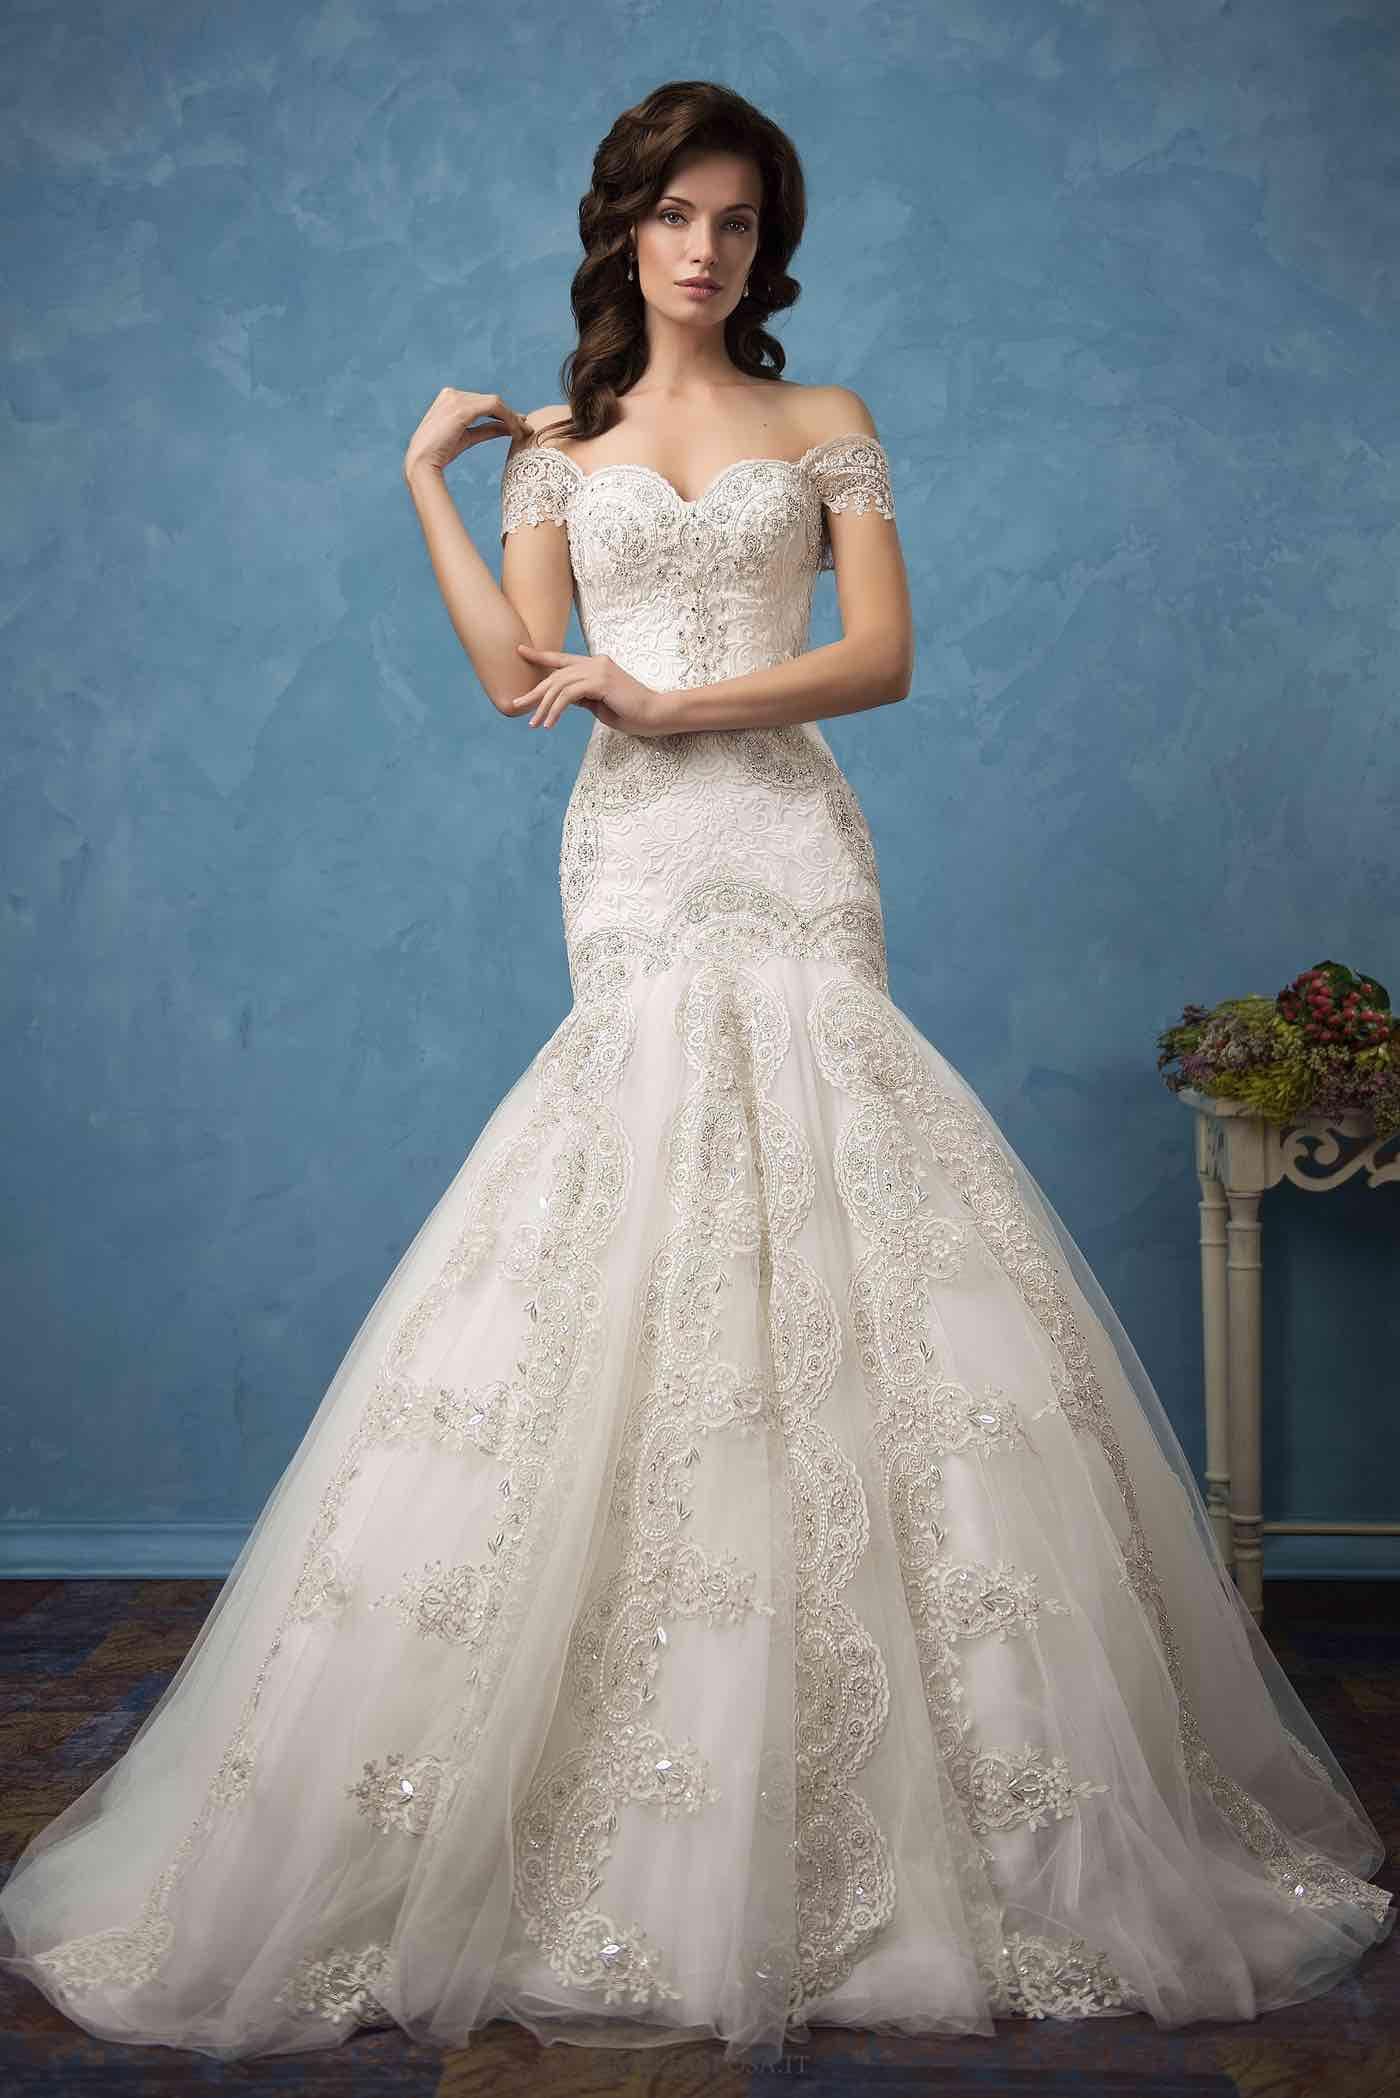 Beautiful Diy Wedding Dress Ideas Photos - Wedding Ideas - memiocall.com